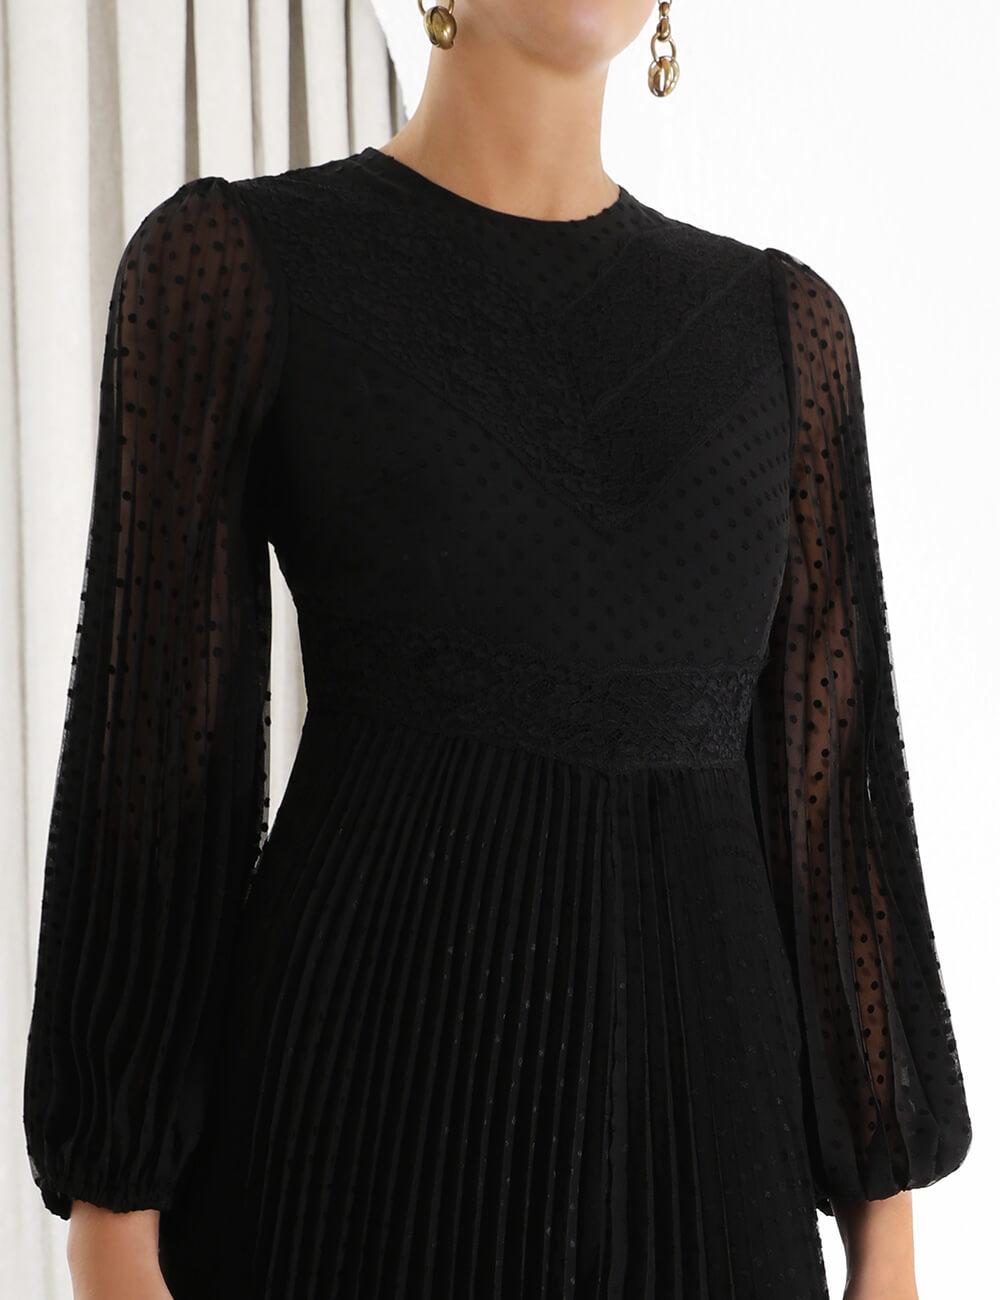 Espionage Lace Panelled Dress